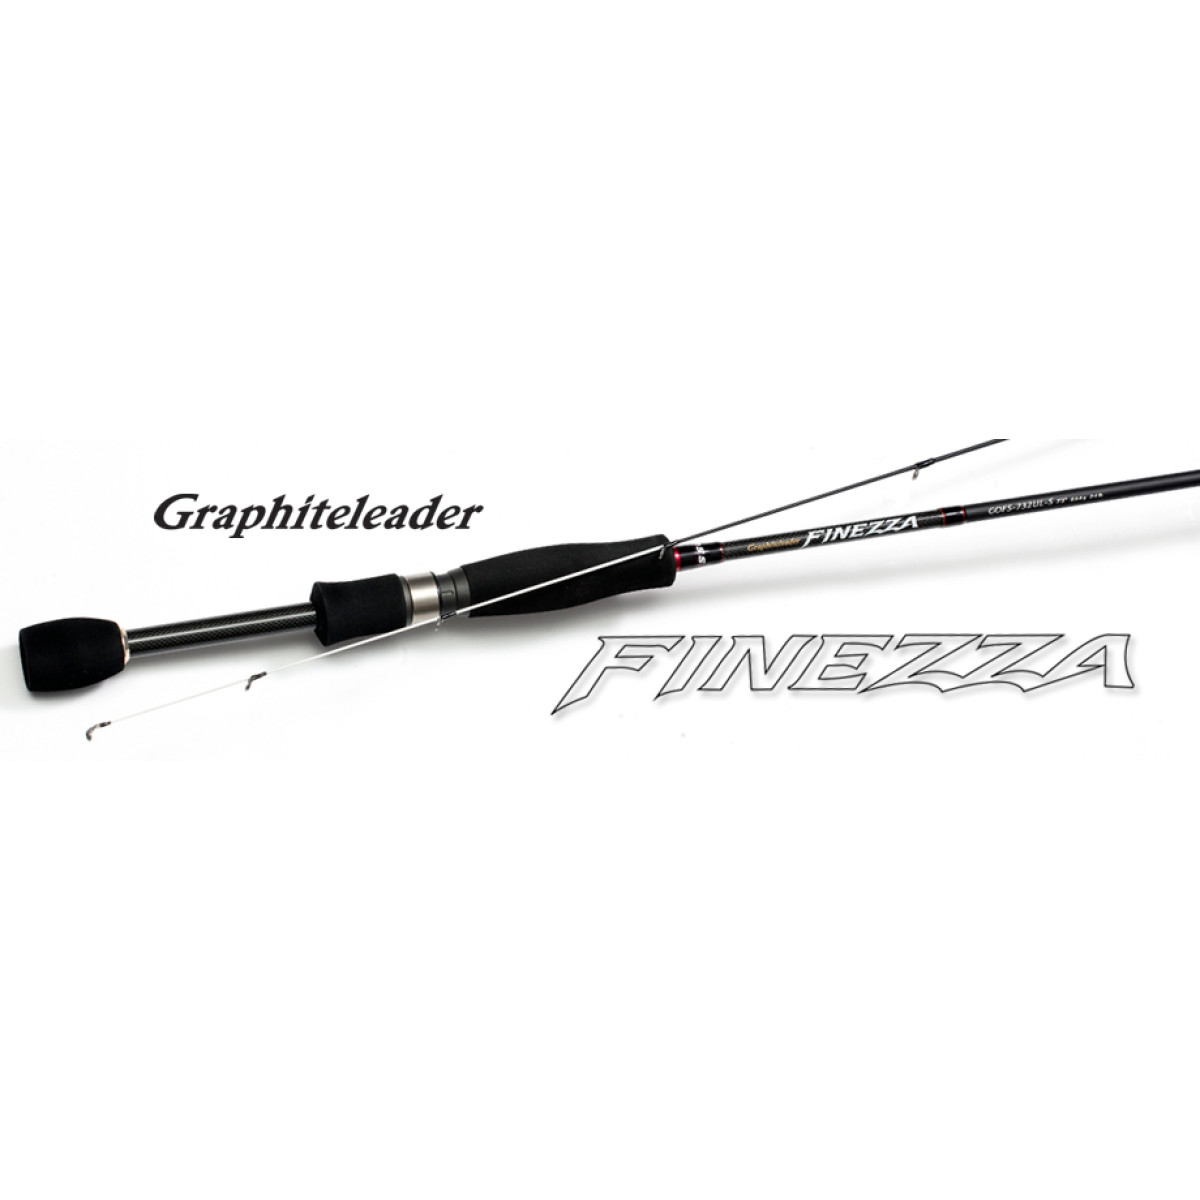 Спиннинг Graphiteleader Finezza Gofs-762UL-S 2.29м 0.5-6гр